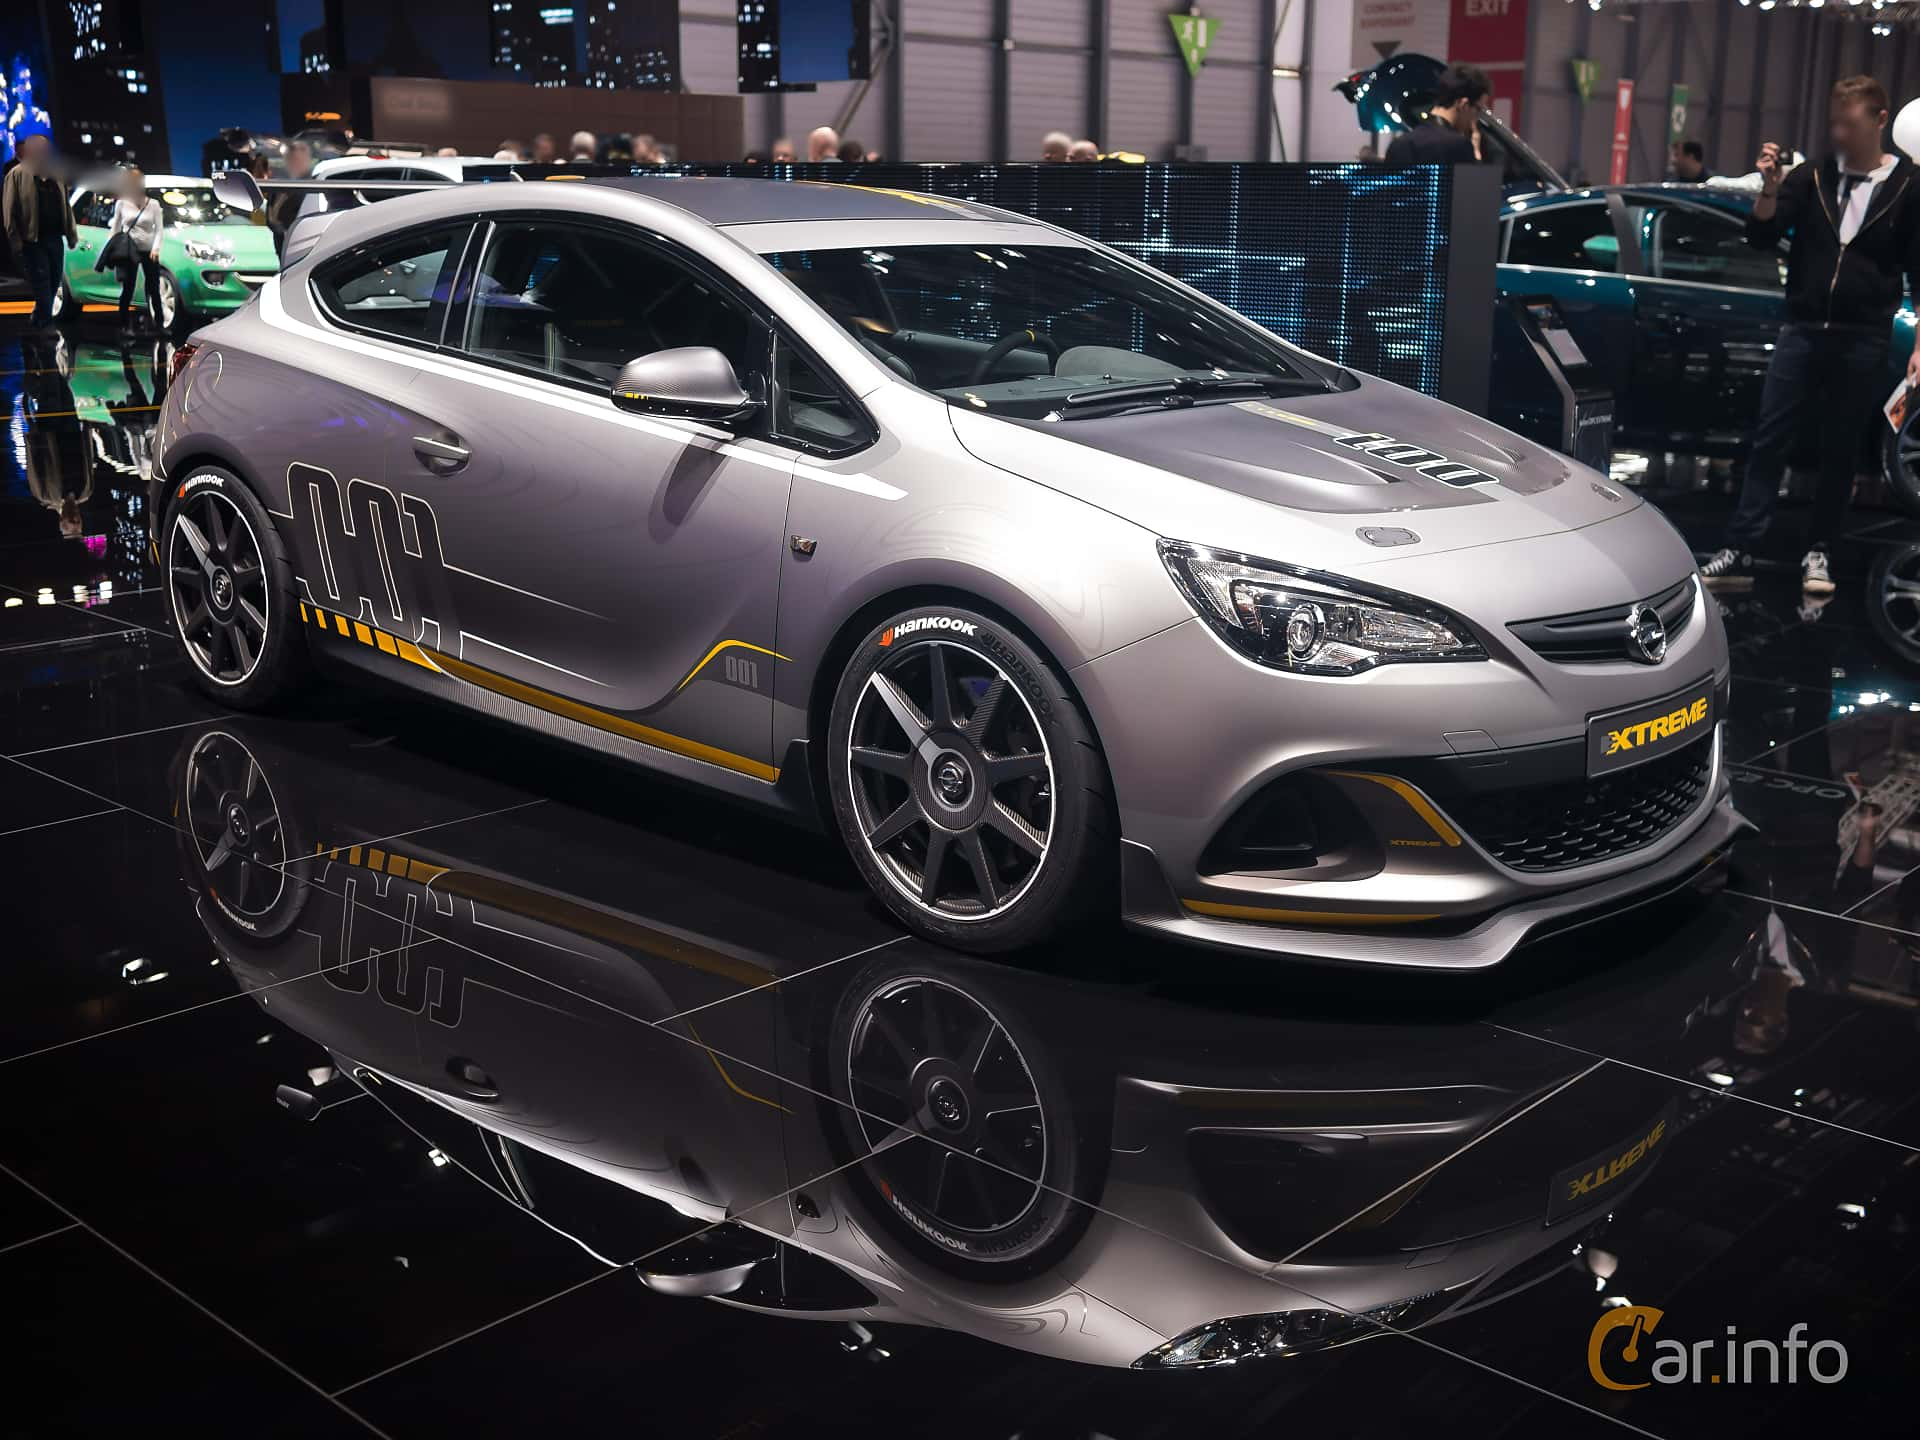 4 Images Of Opel Astra Opc Extreme 2 0 Sidi Turbo Ecoflex Manual